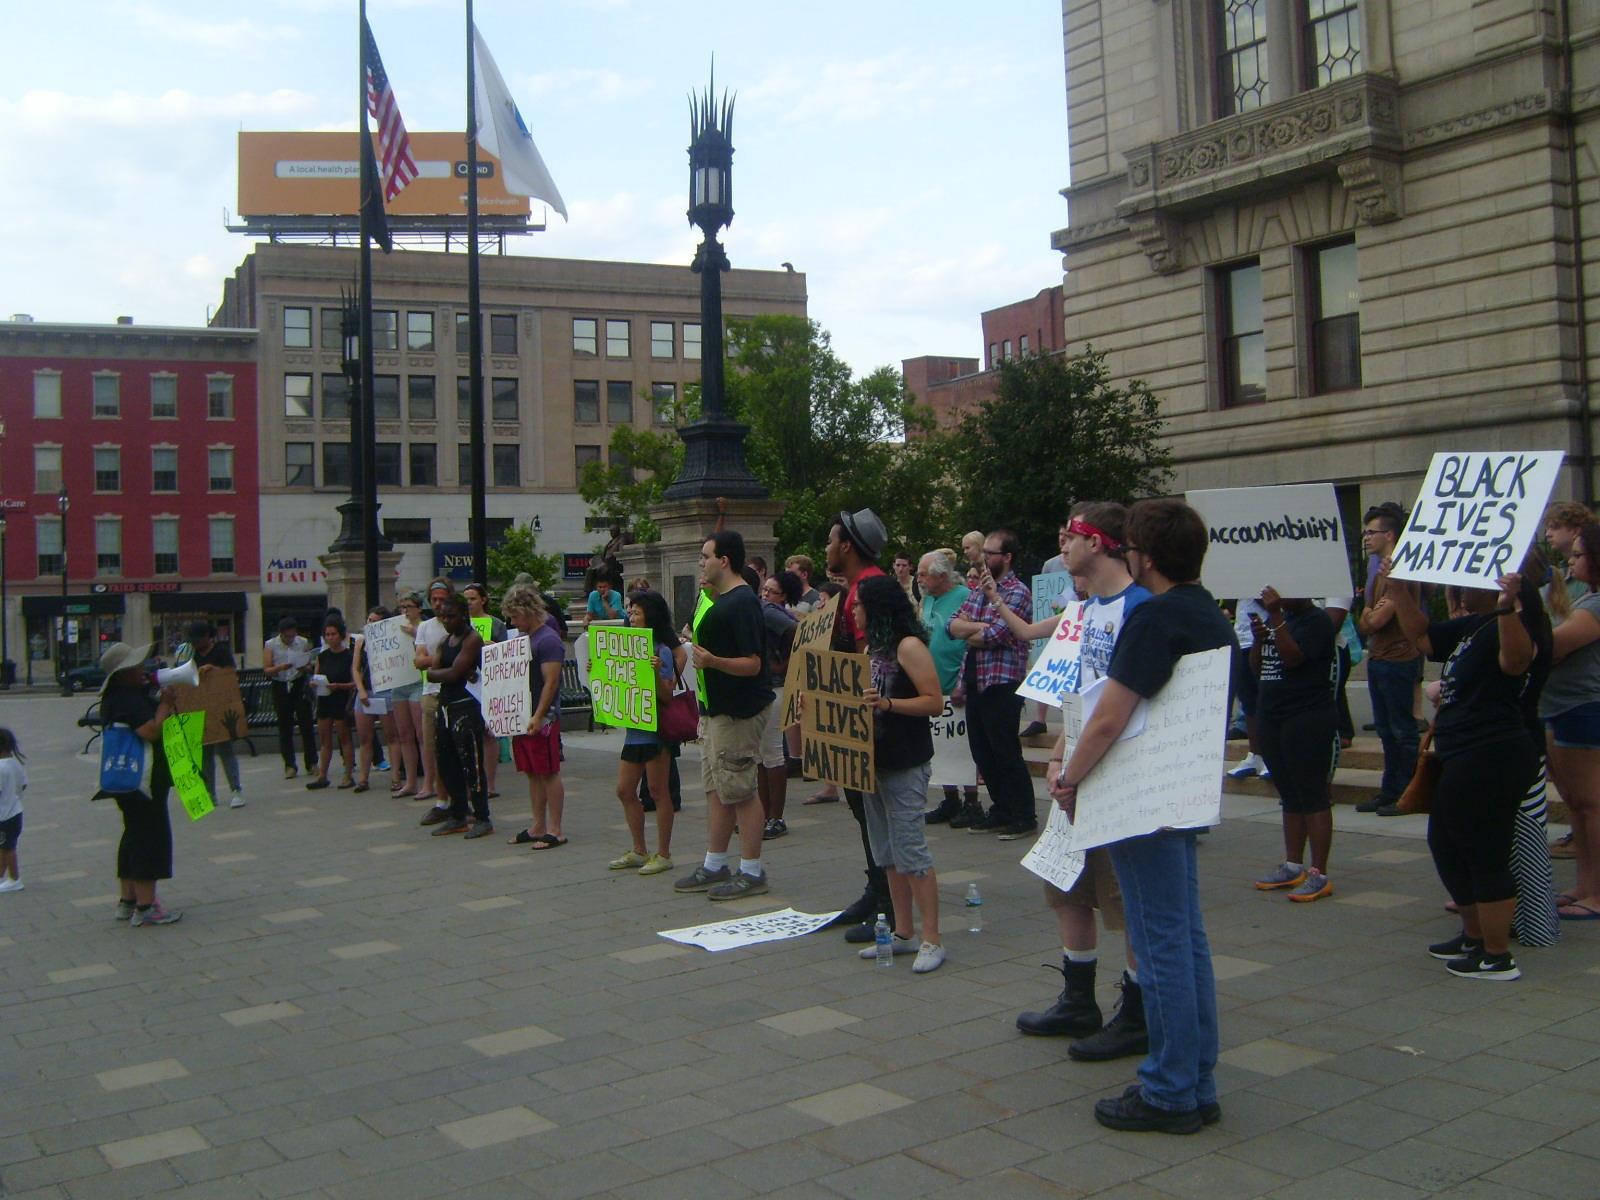 Demo at City Hall 7-7-16